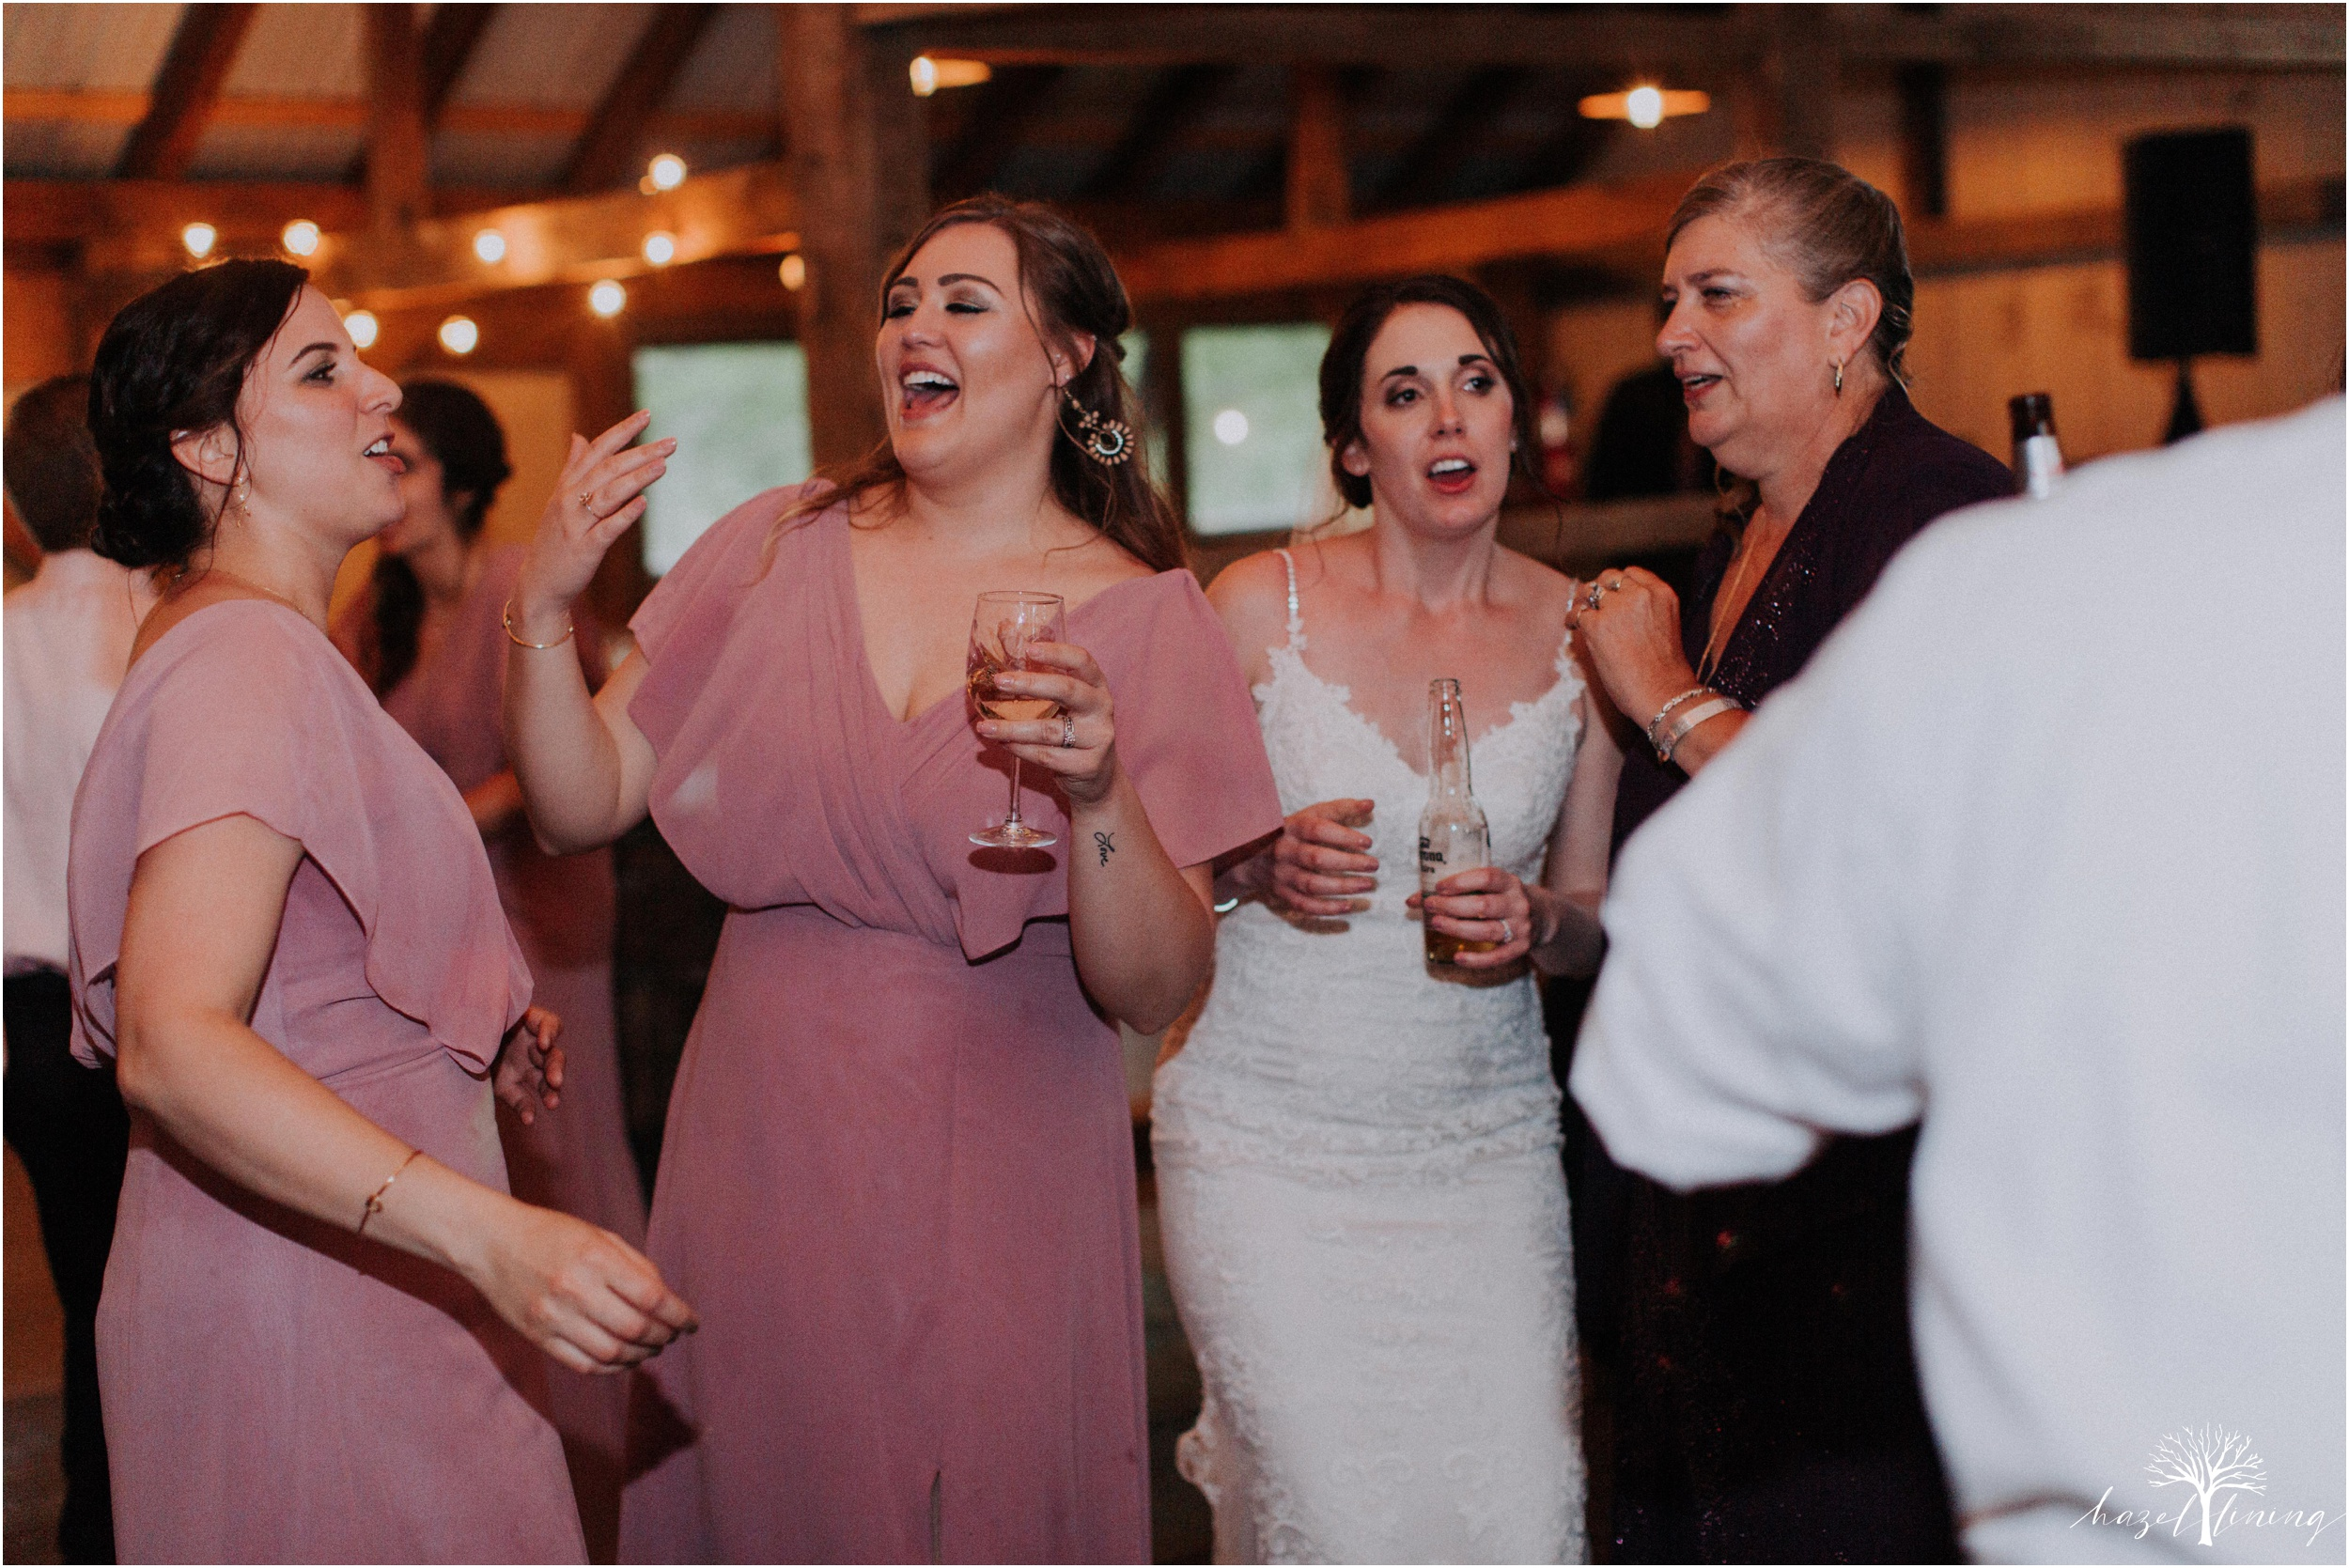 hazel-lining-travel-wedding-elopement-photography-lisa-landon-shoemaker-the-farm-bakery-and-events-bucks-county-quakertown-pennsylvania-summer-country-outdoor-farm-wedding_0152.jpg